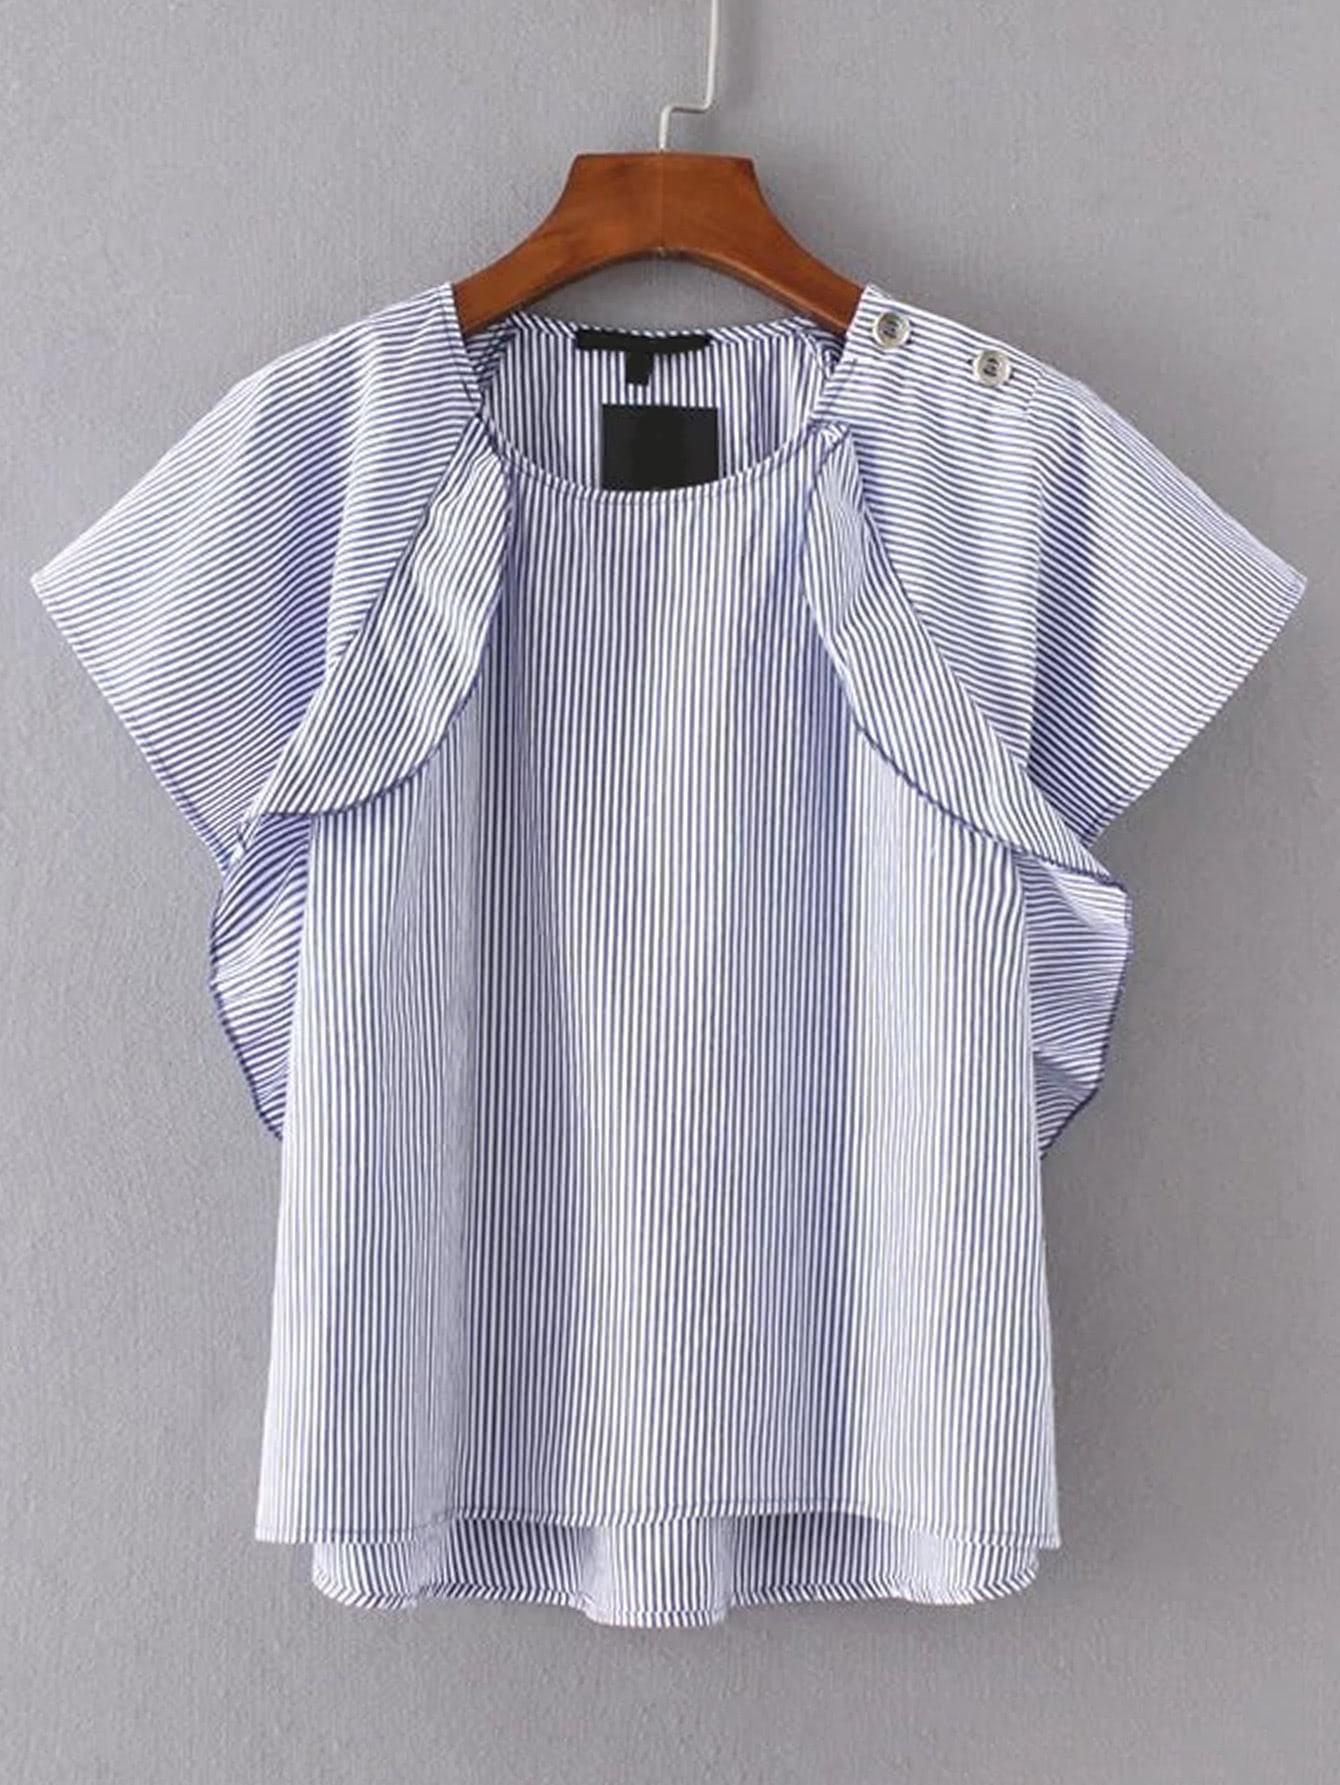 Raglan Sleeve Vertical Striped High Low Top blouse170425201